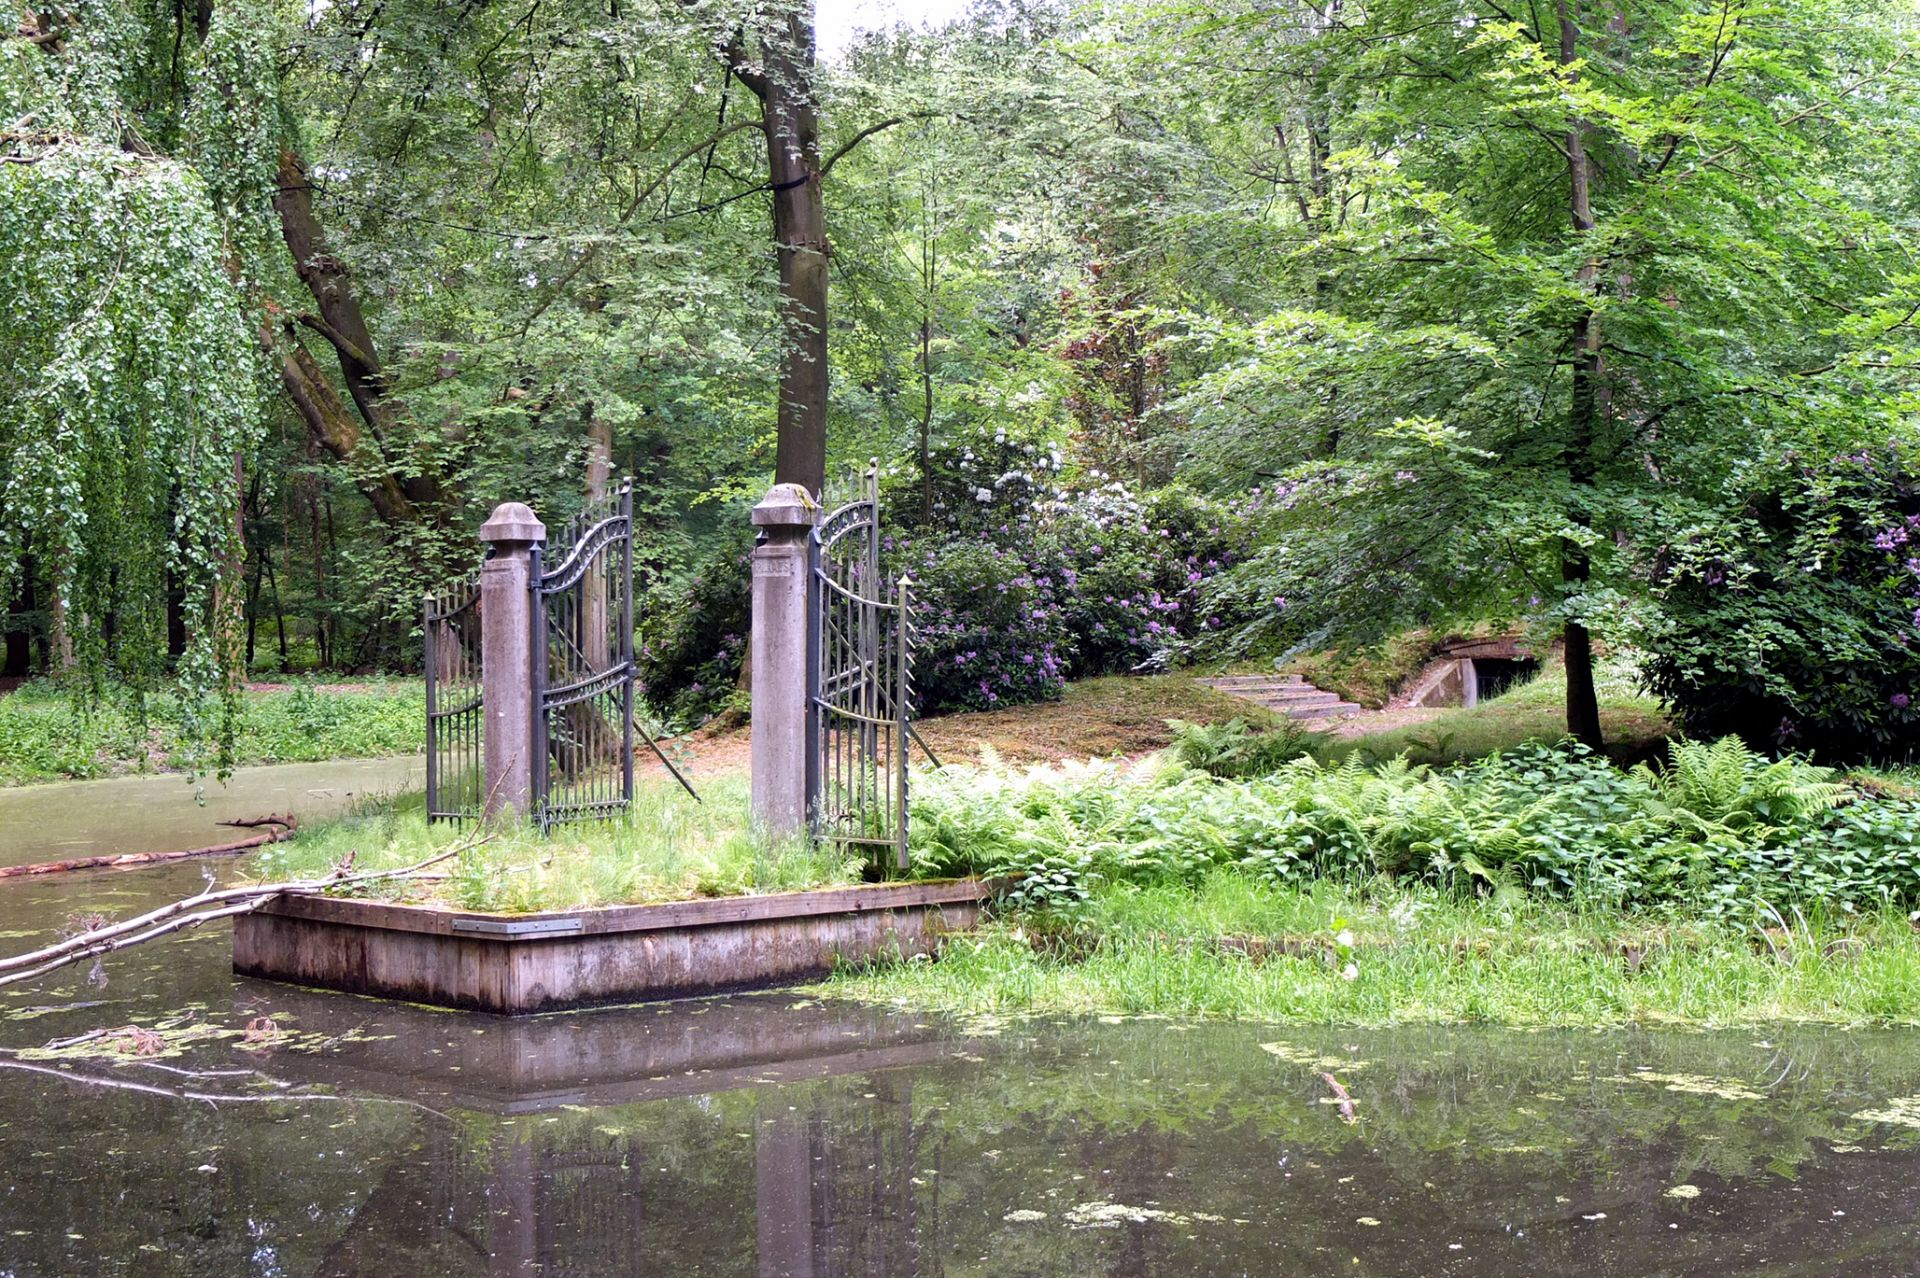 Willie van Knippenberg: Eiland in de Warande